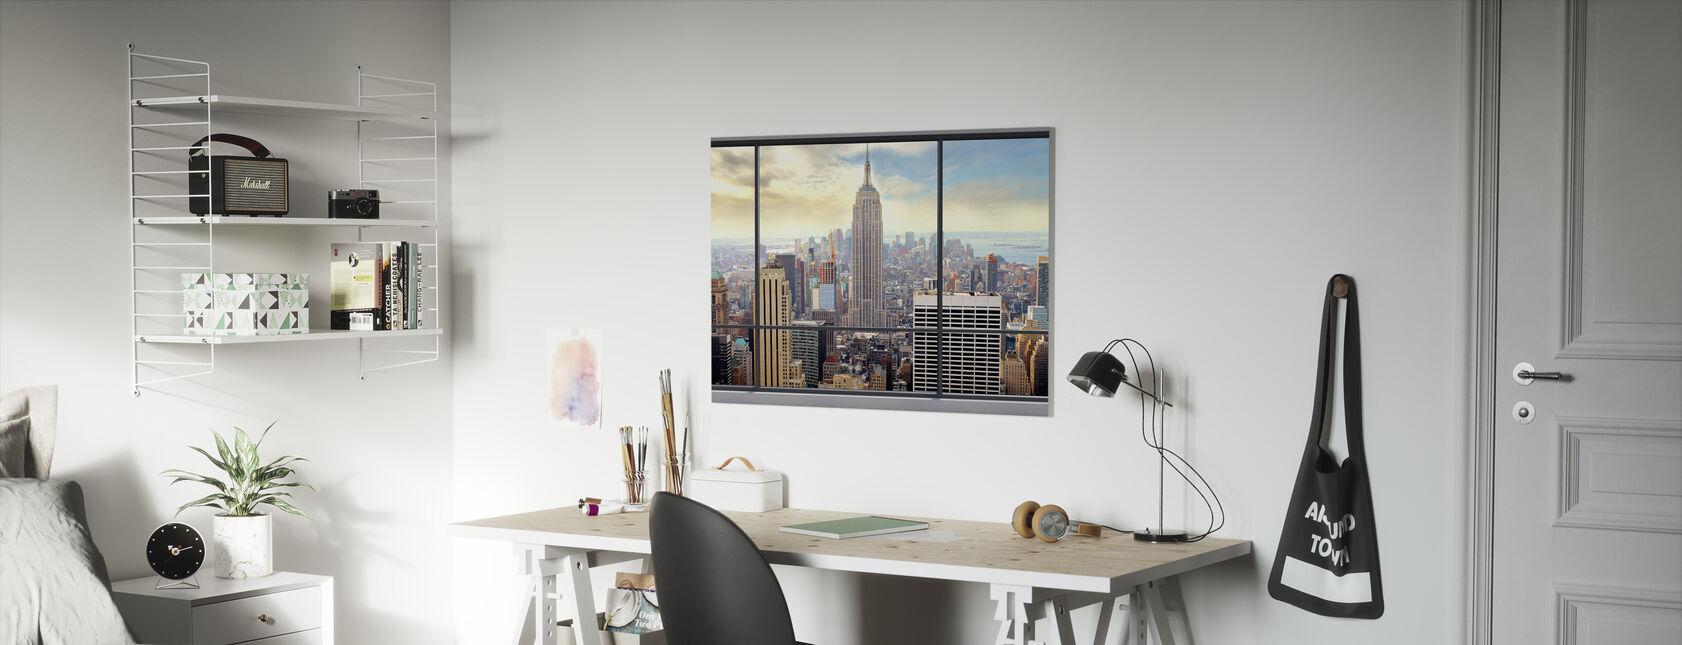 Penthouse Window View - Canvas print - Kids Room